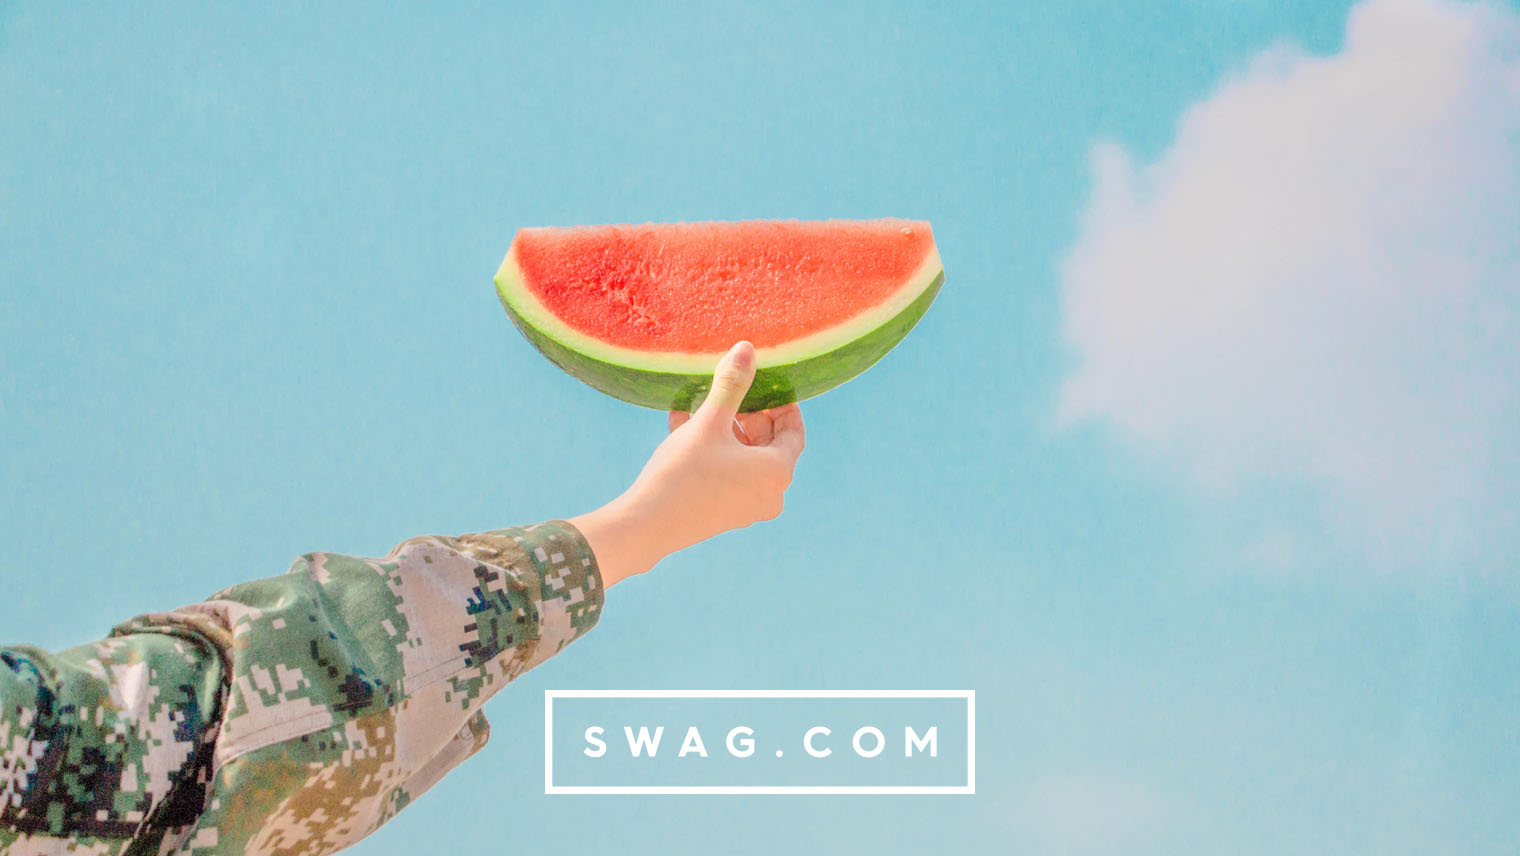 Summer Swag, Summertime Swag Ideas & Gift Ideas for Hot Summer Days